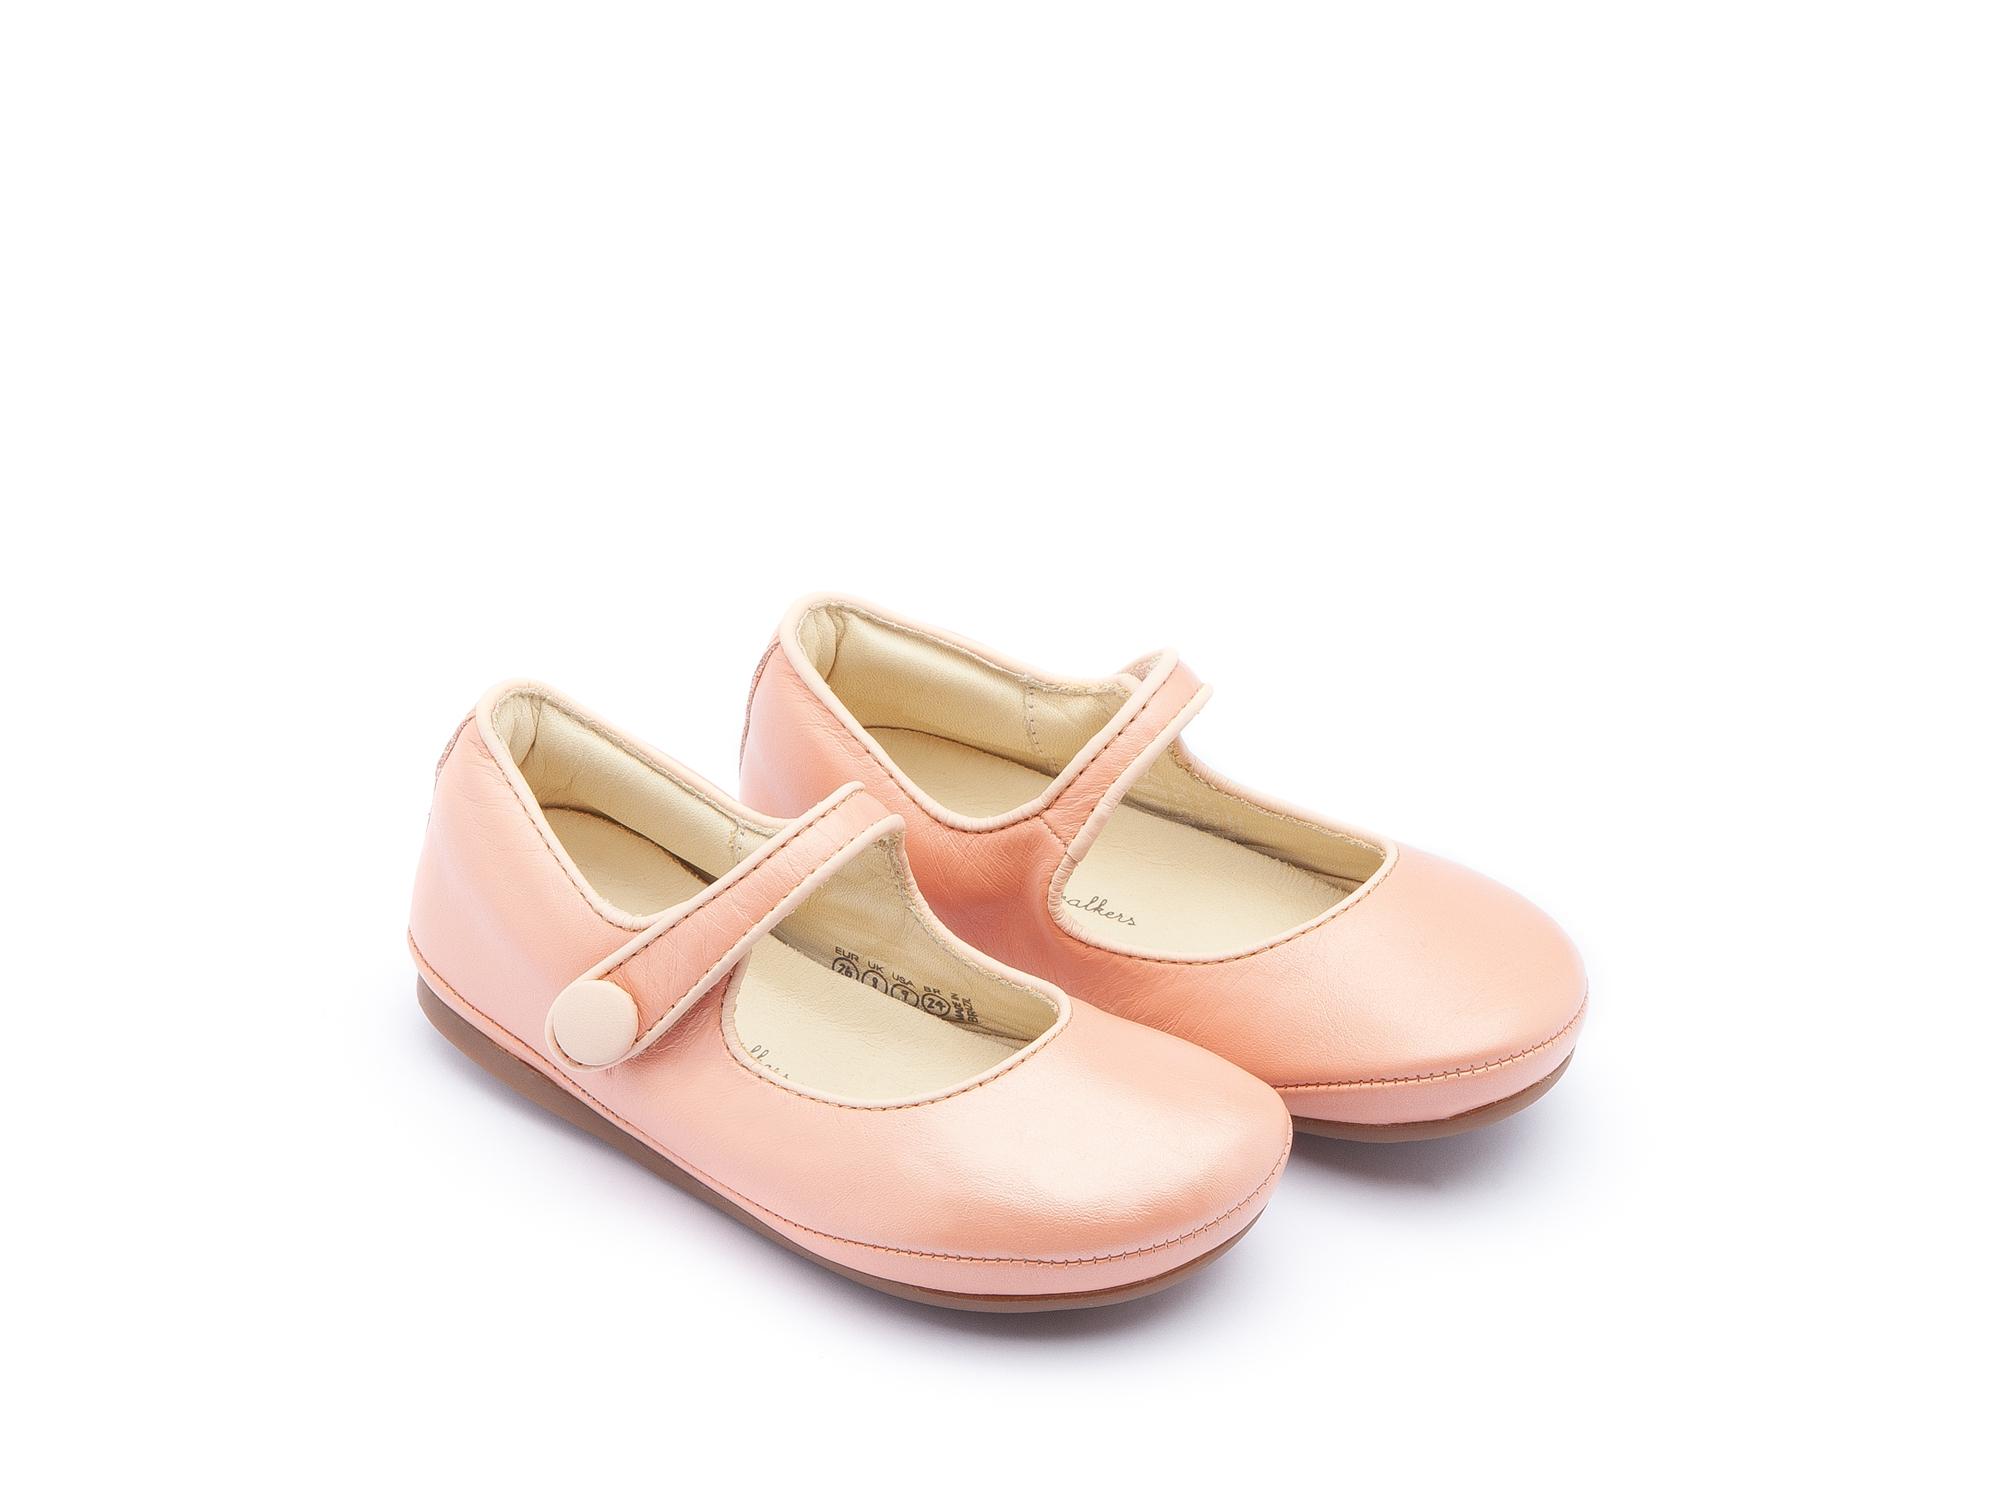 Boneca Little Gavotte Flamingo/ Papaya Cream Toddler 2 à 4 anos - 0